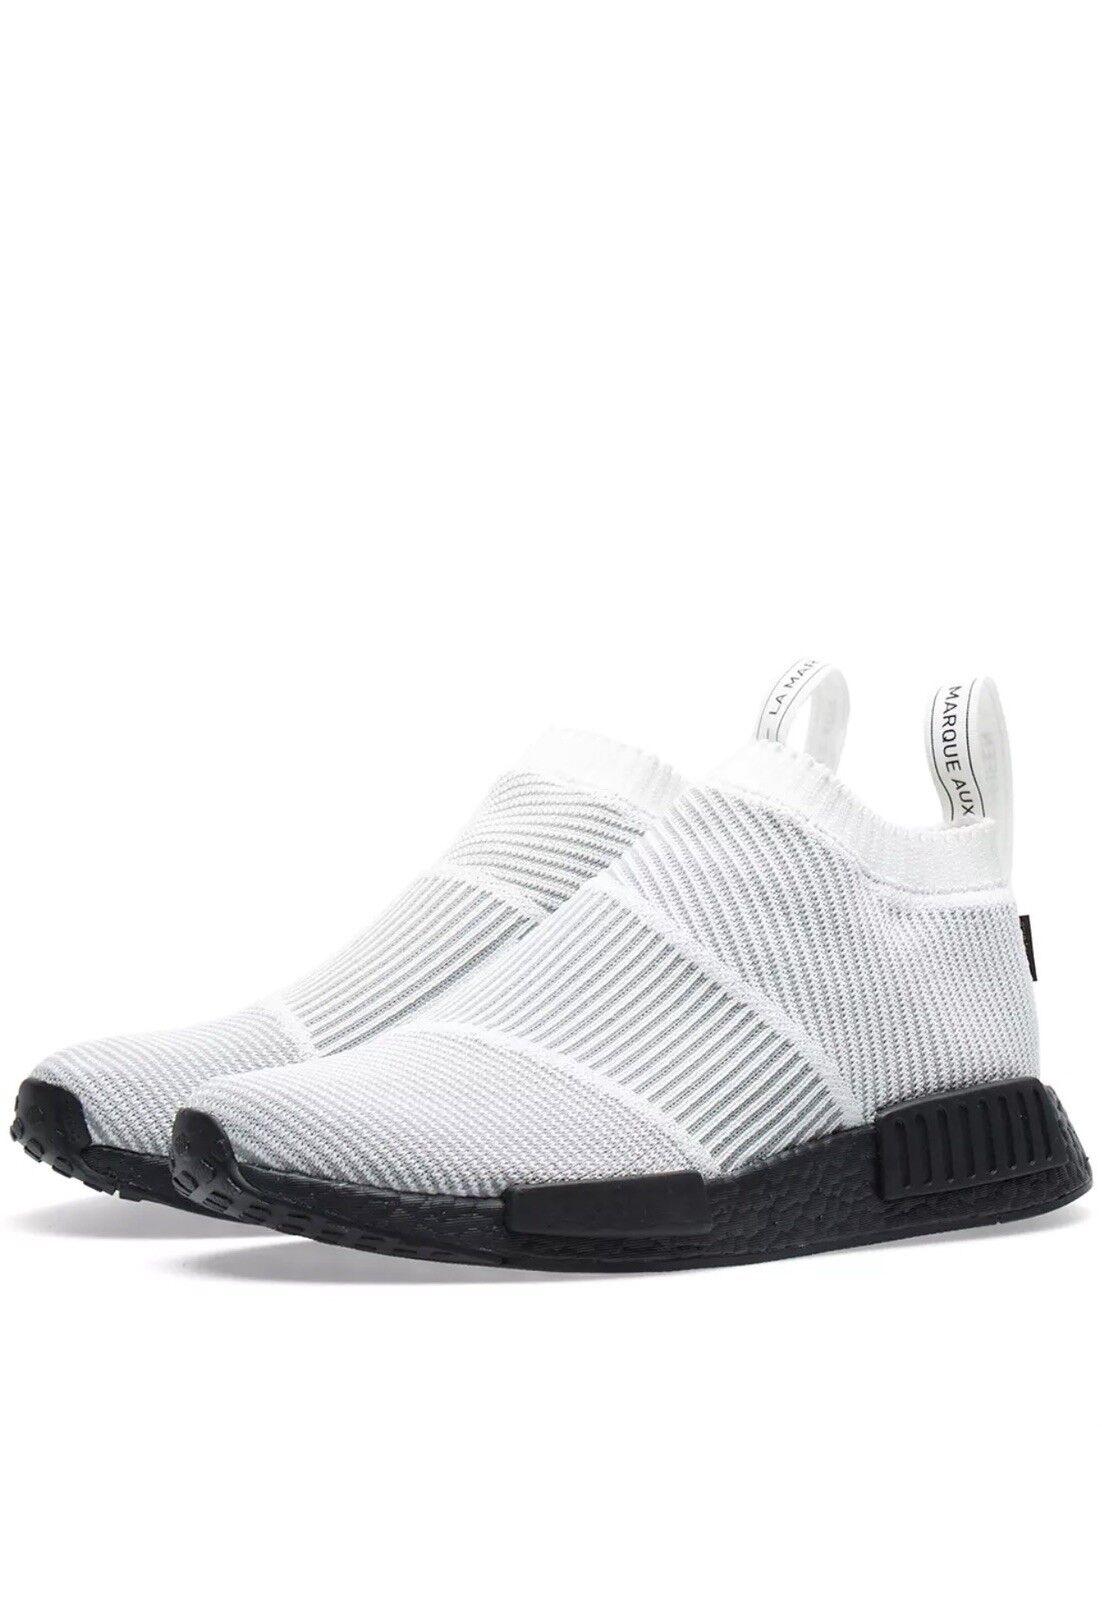 Adidas nmd cs1 pk.ultra misura 8,5 bianco nero.by9404.gortex.primeknit pk.ultra cs1 impulso b6711c